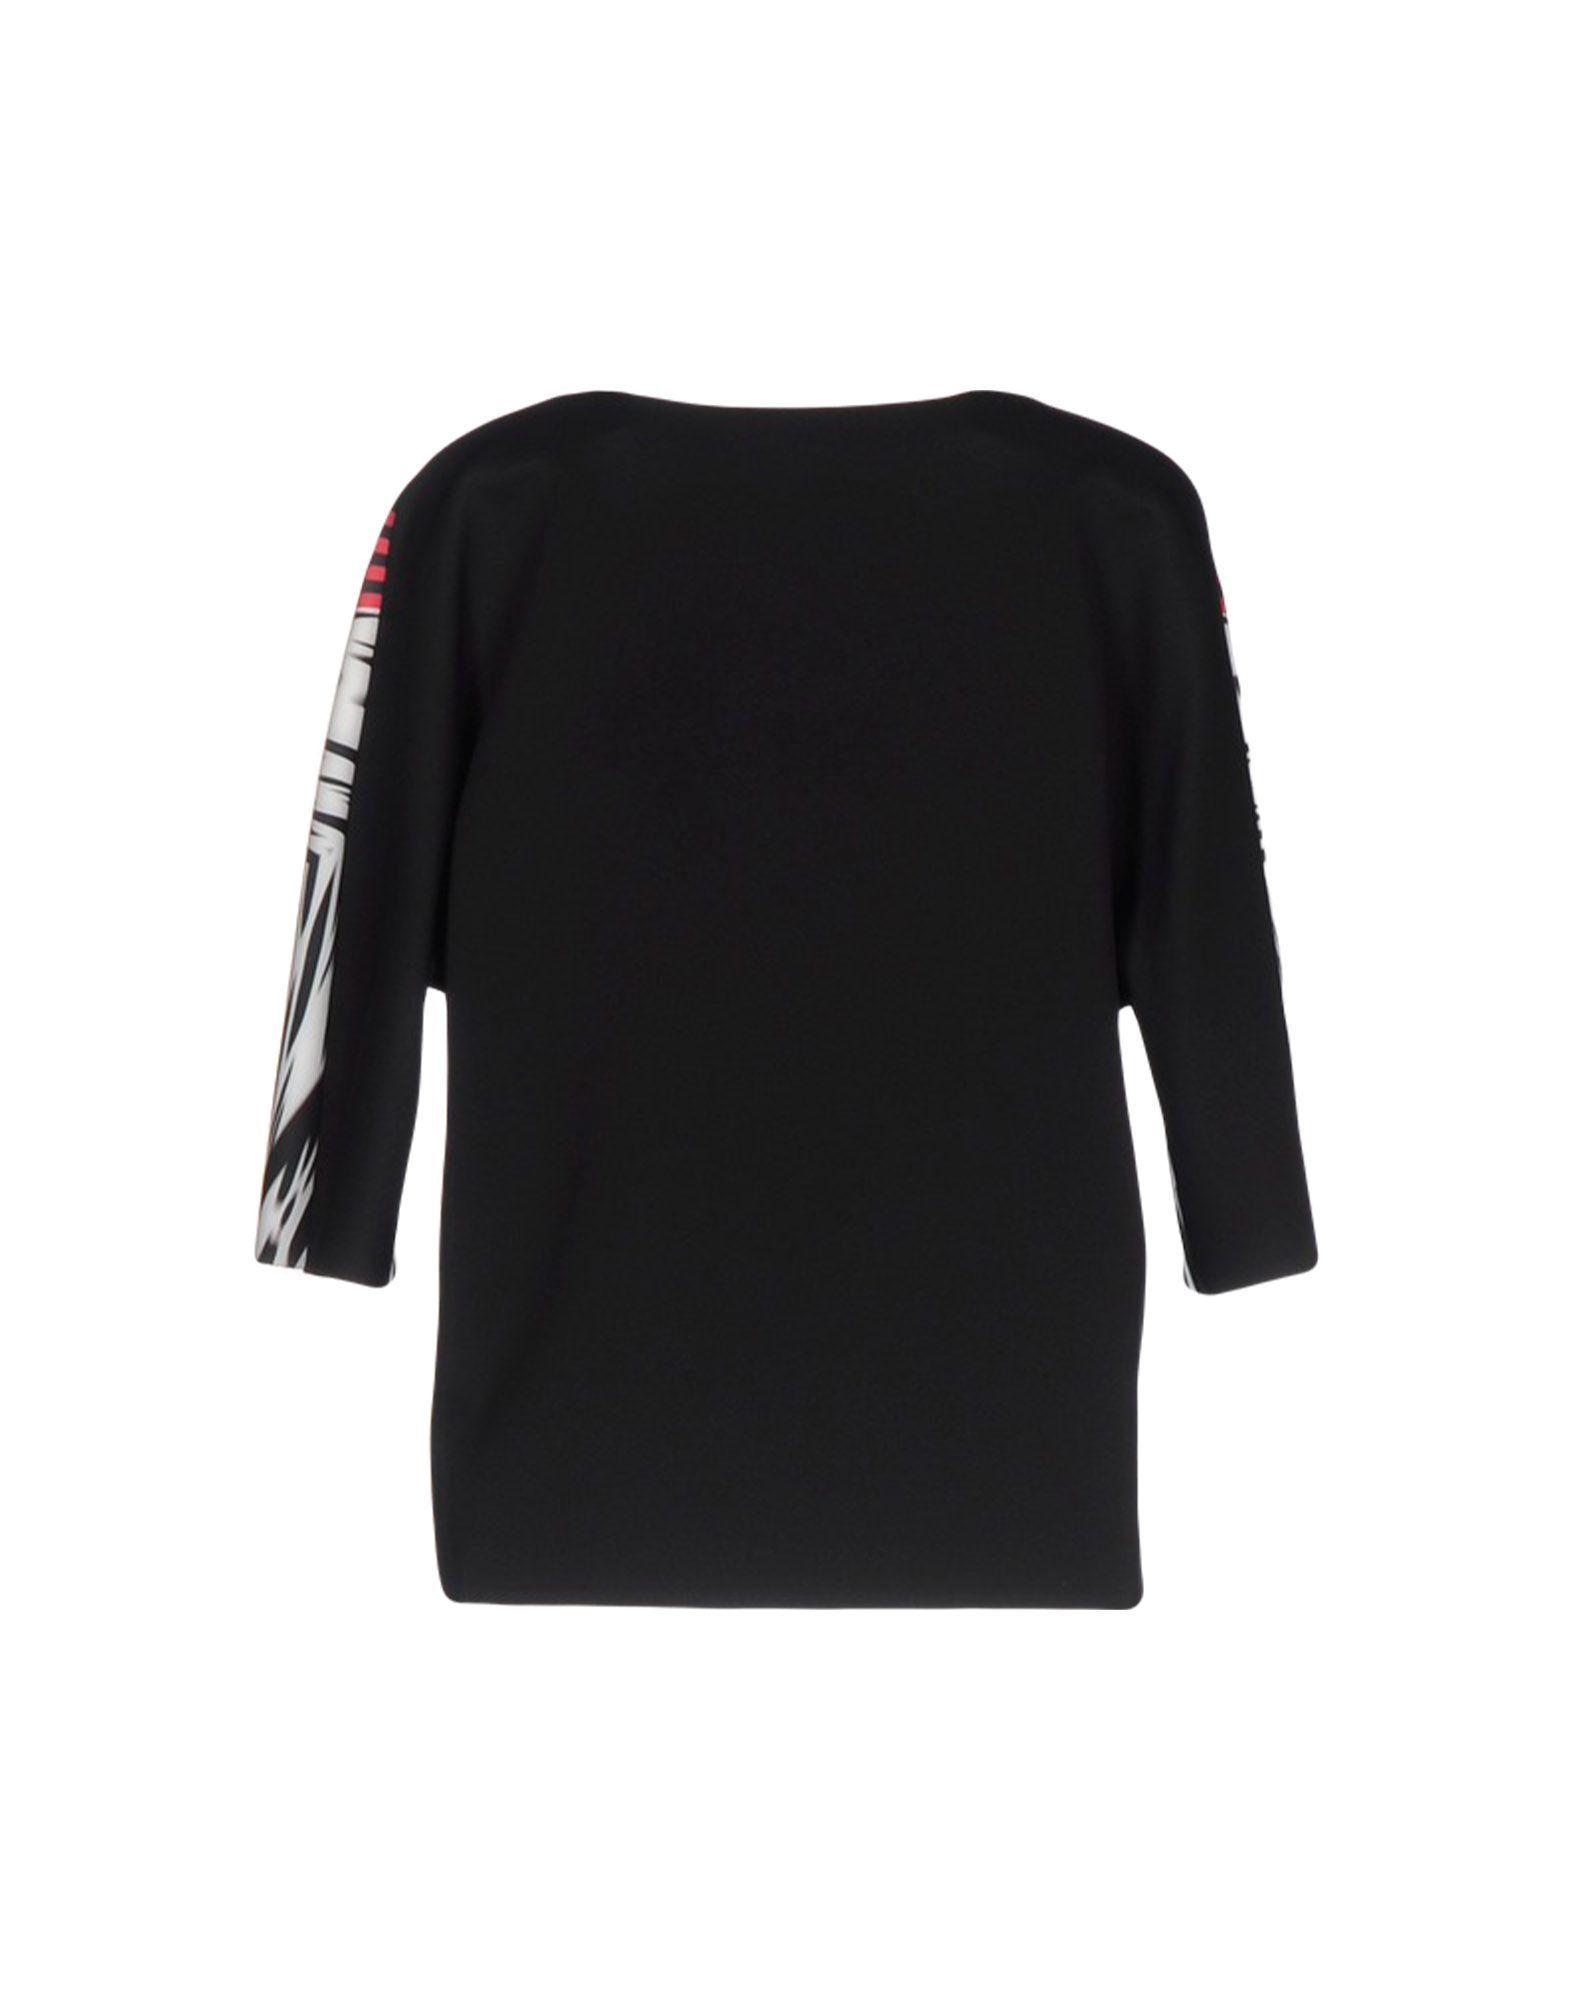 Byblos Black Print Short Sleeve Blouse